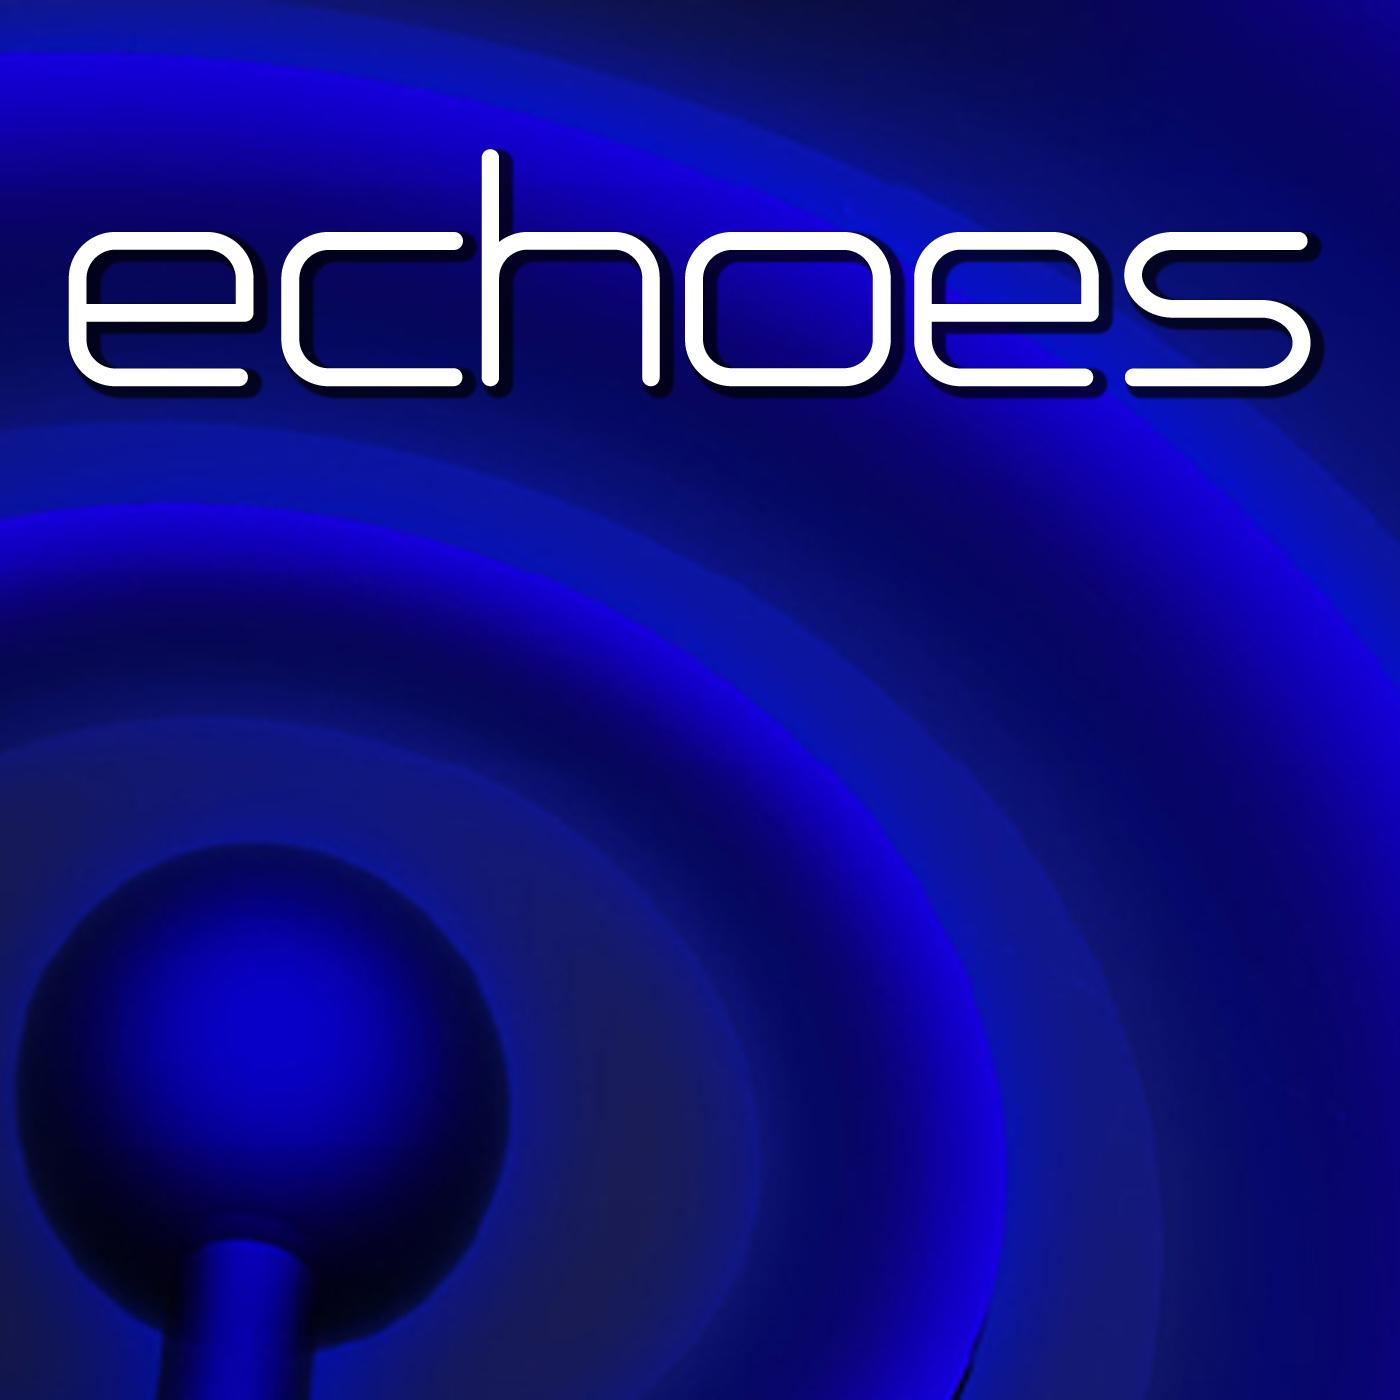 Echoeslogo-square-1400_small